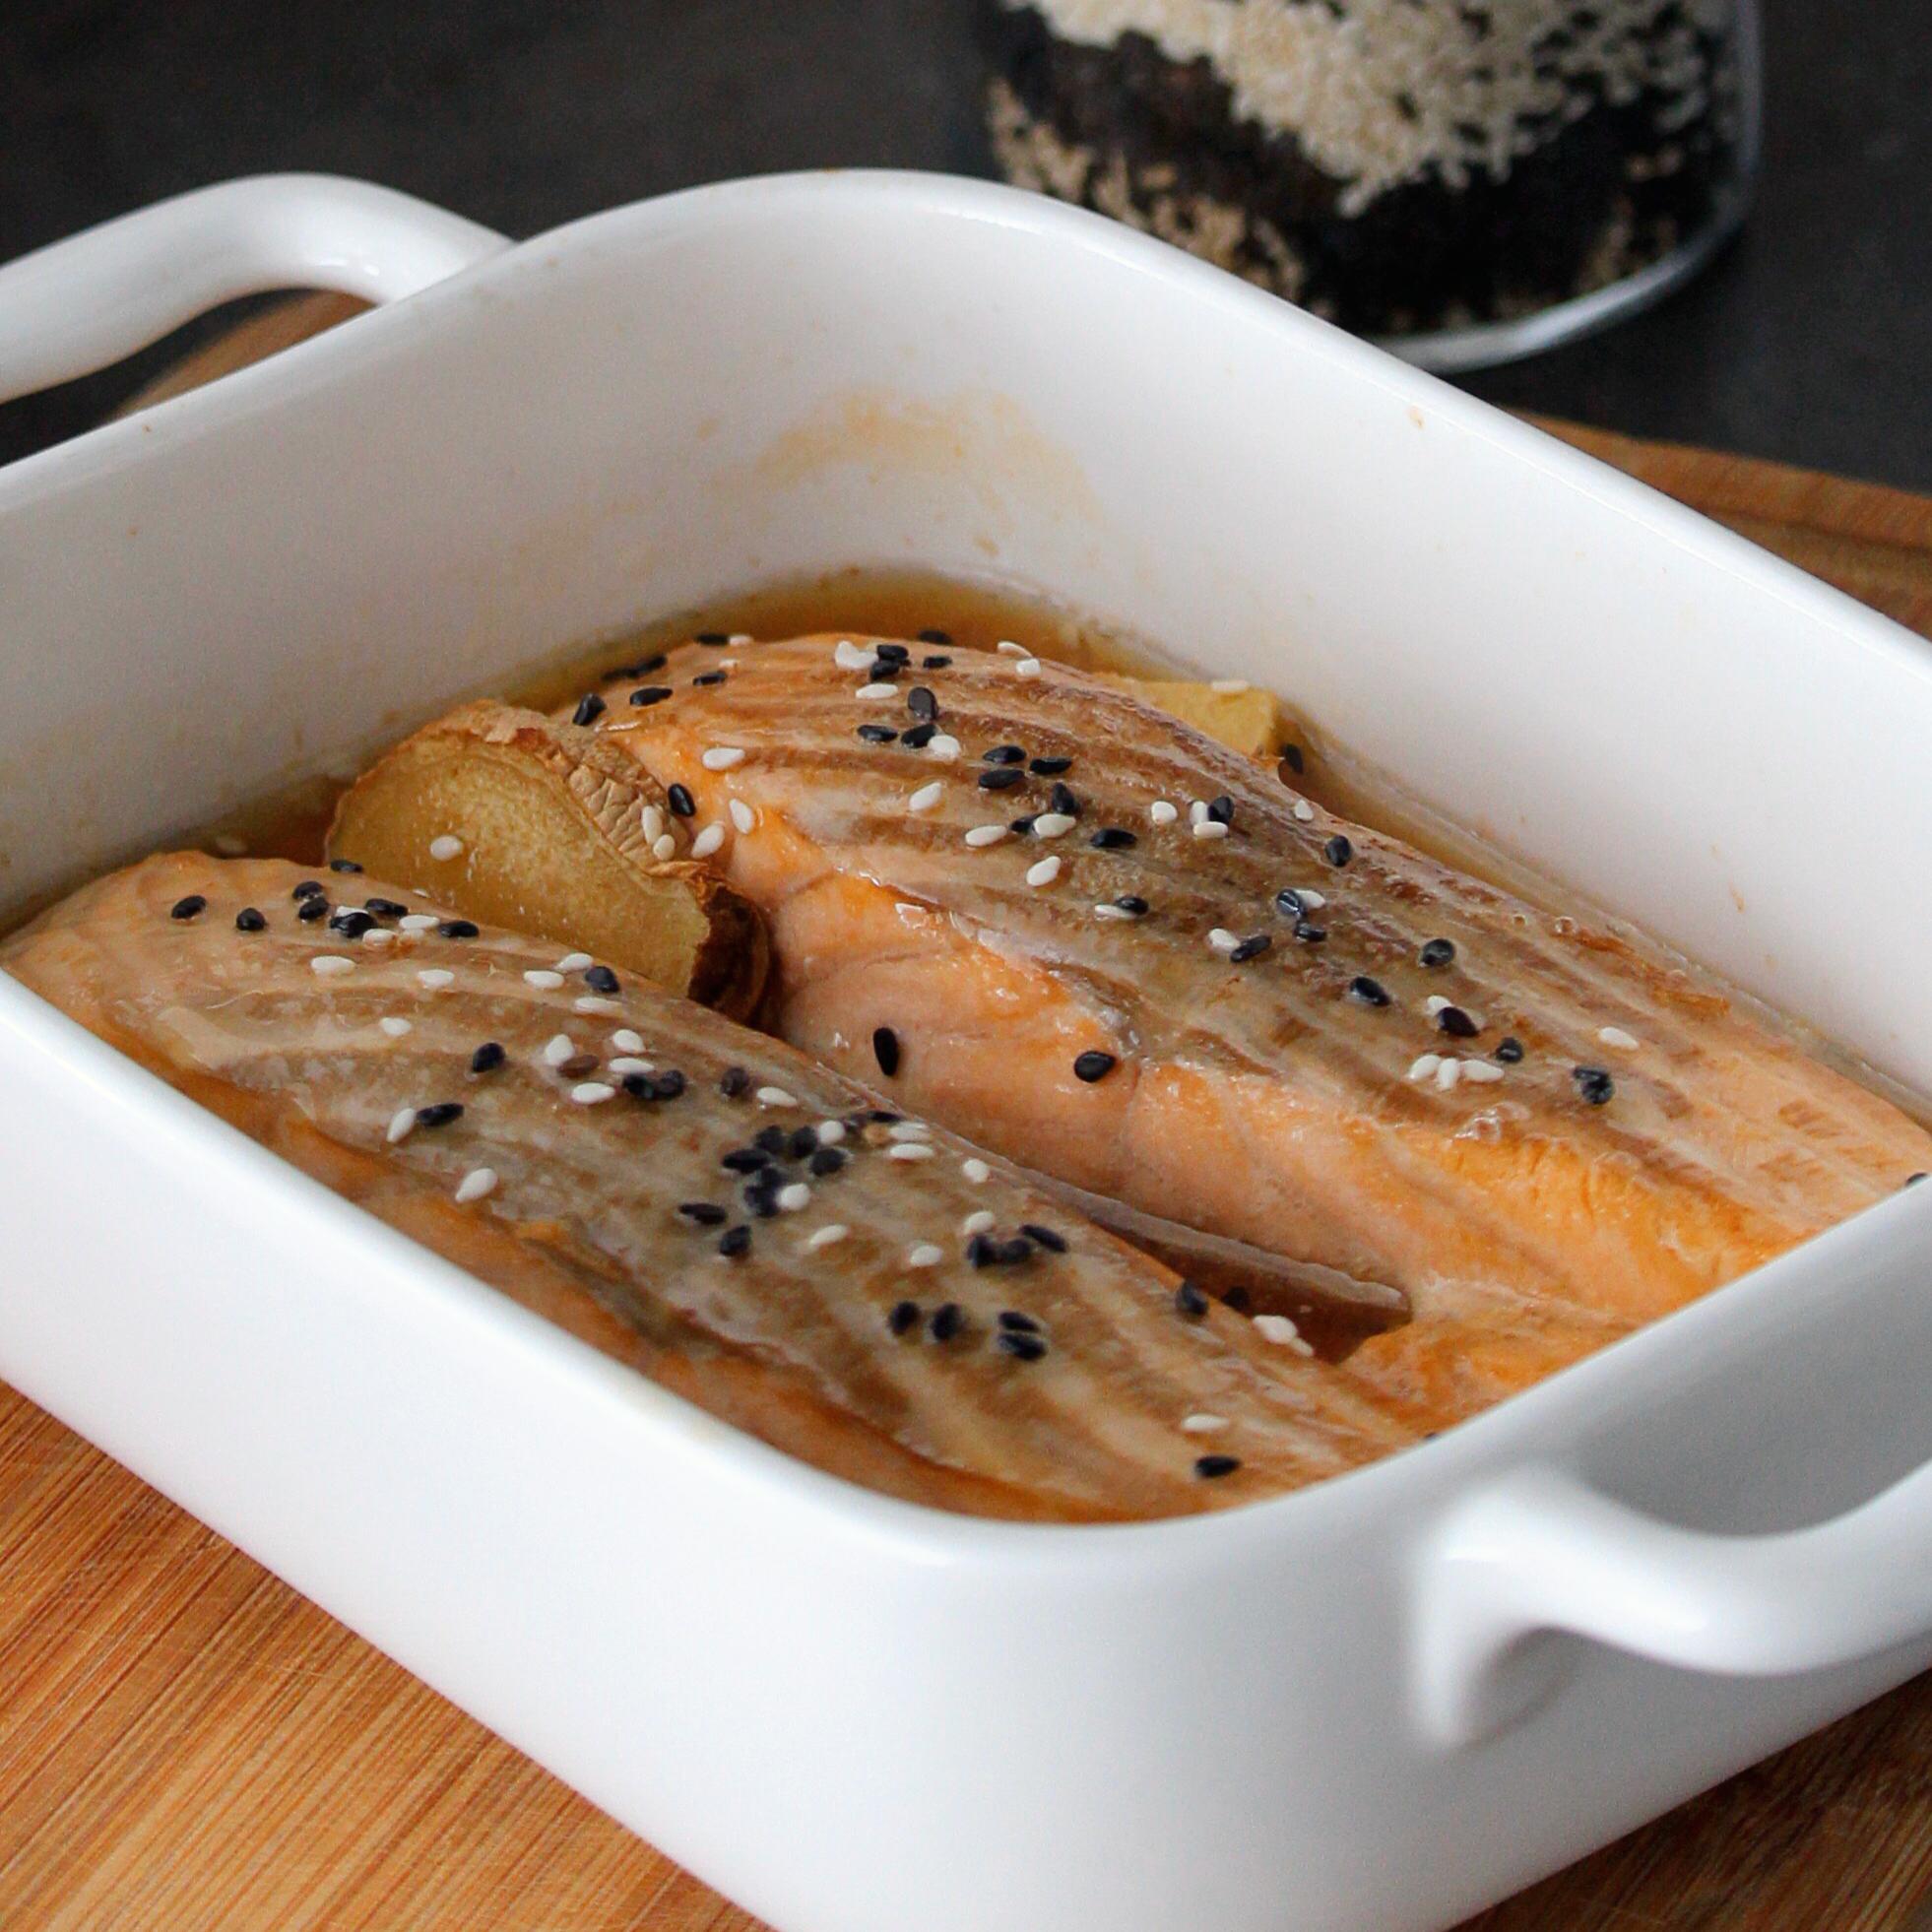 Ginger-Soy Baked Salmon